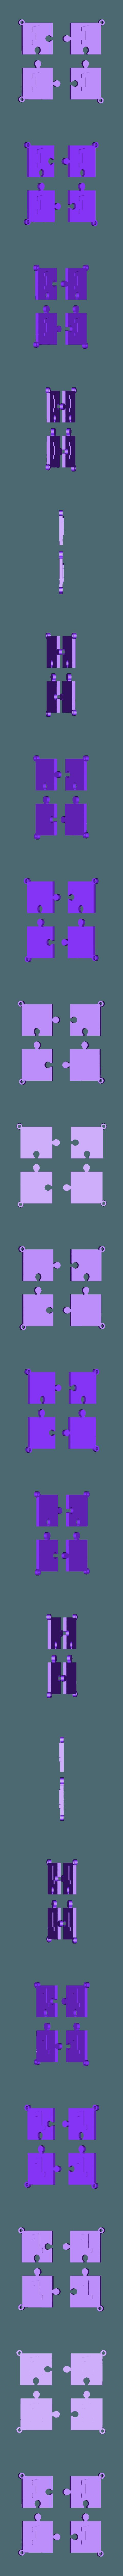 puzzle 1.stl Download STL file puzzle key ring • 3D printing design, catf3d